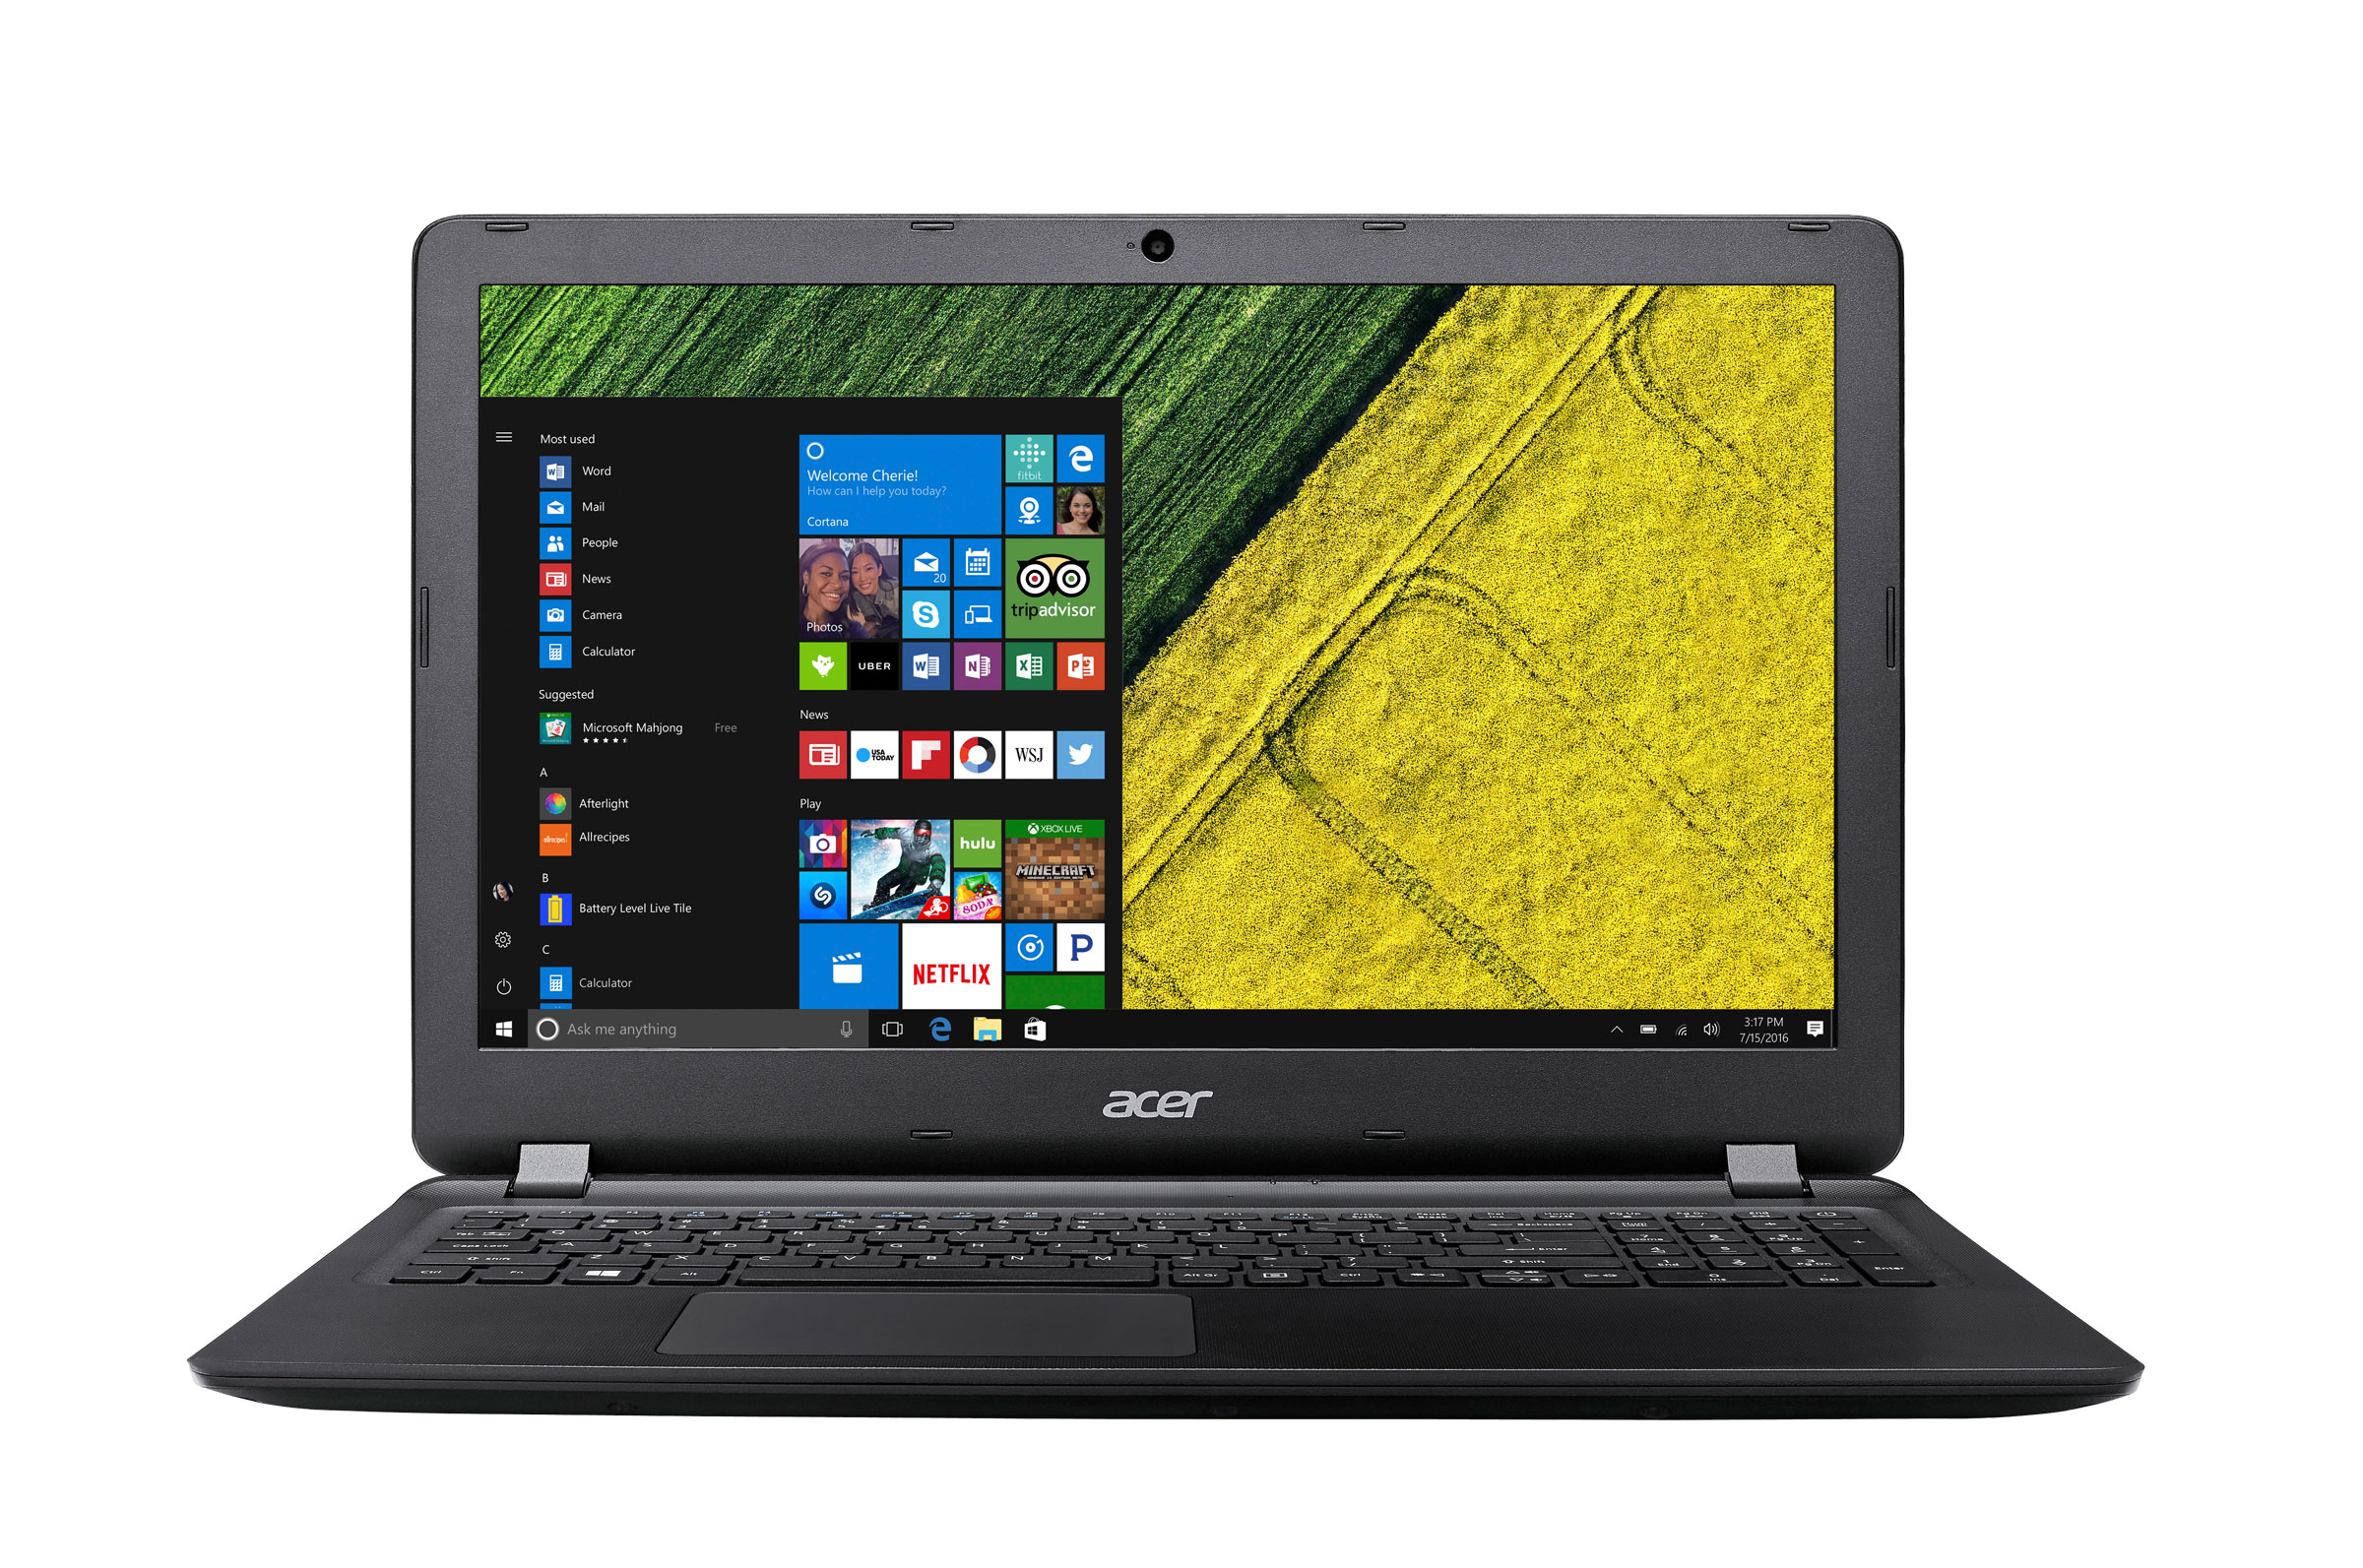 Stockists of Acer Aspire ES 15 ES1-533-C1D8 Intel Celeron 500GB HDD 4GB RAM 156 Notebook